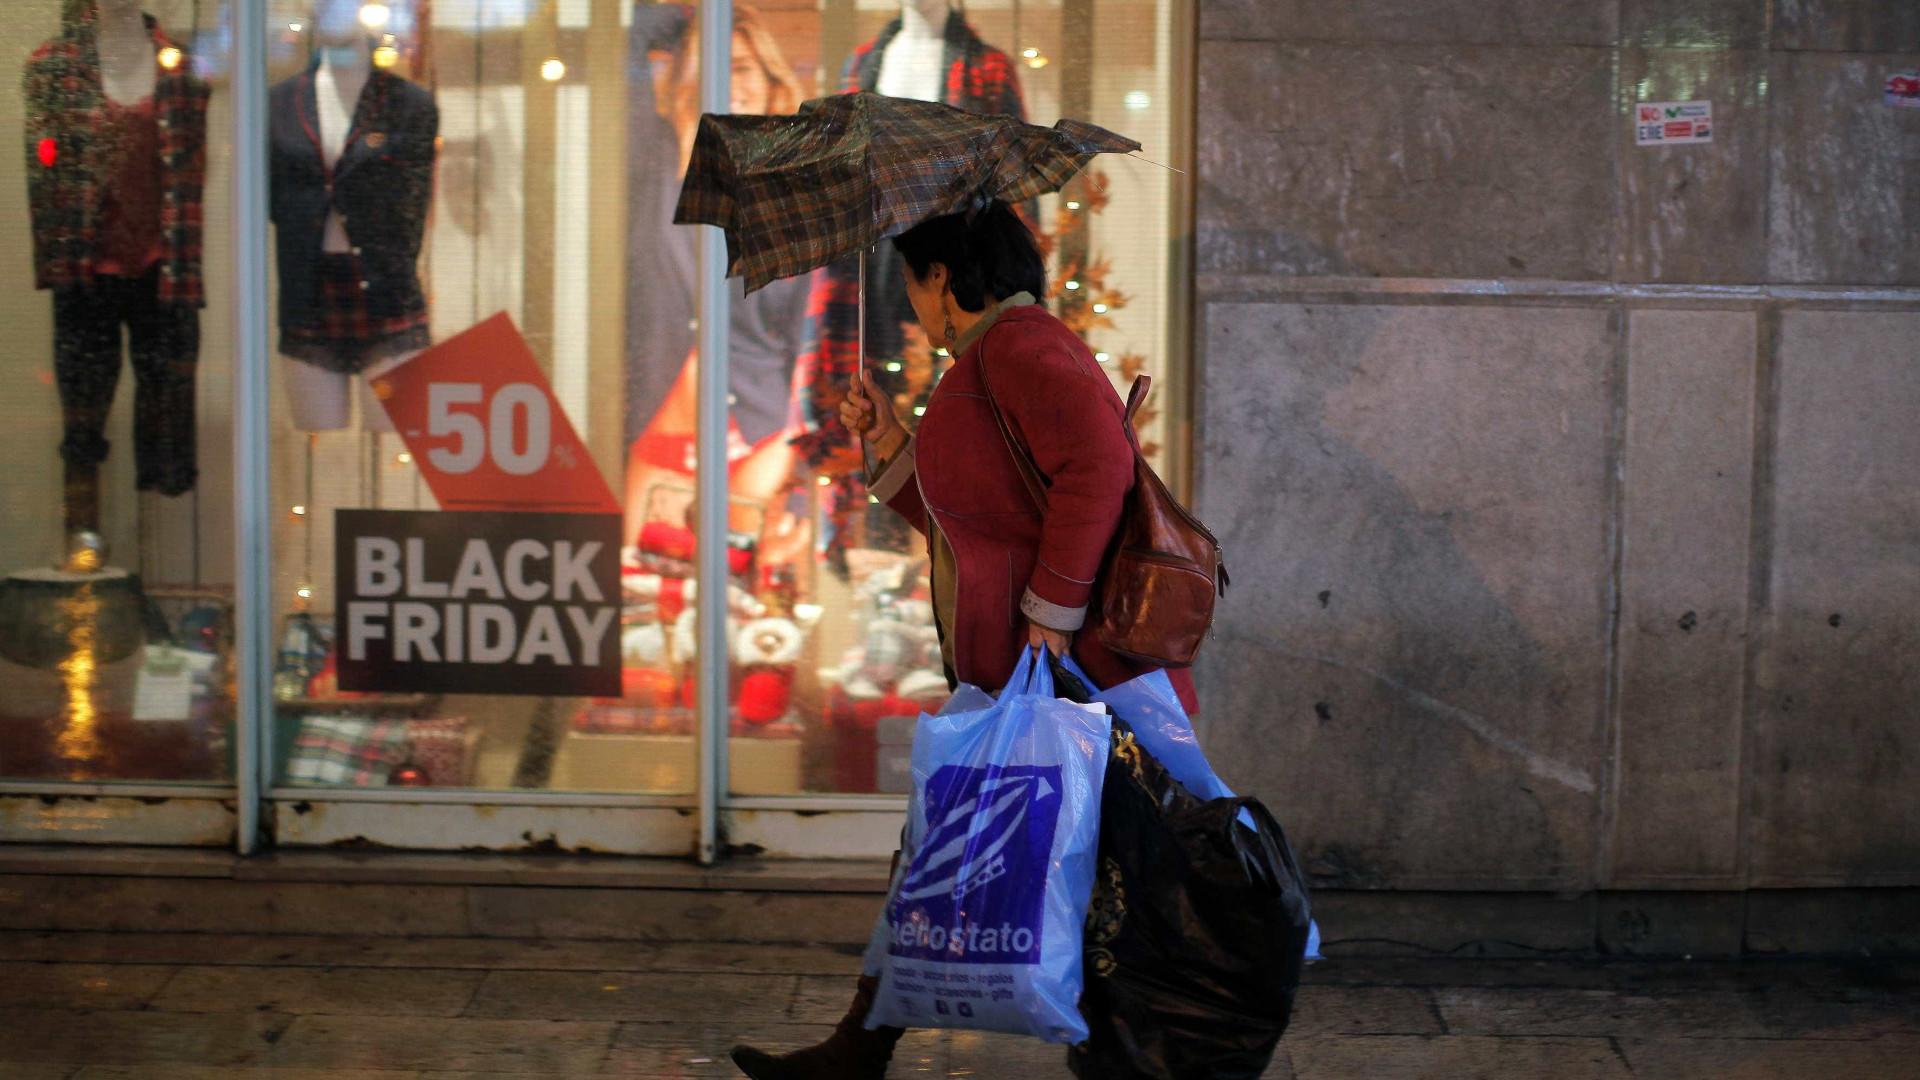 Procon divulga lista de lojas para serem evitadas no Black Friday